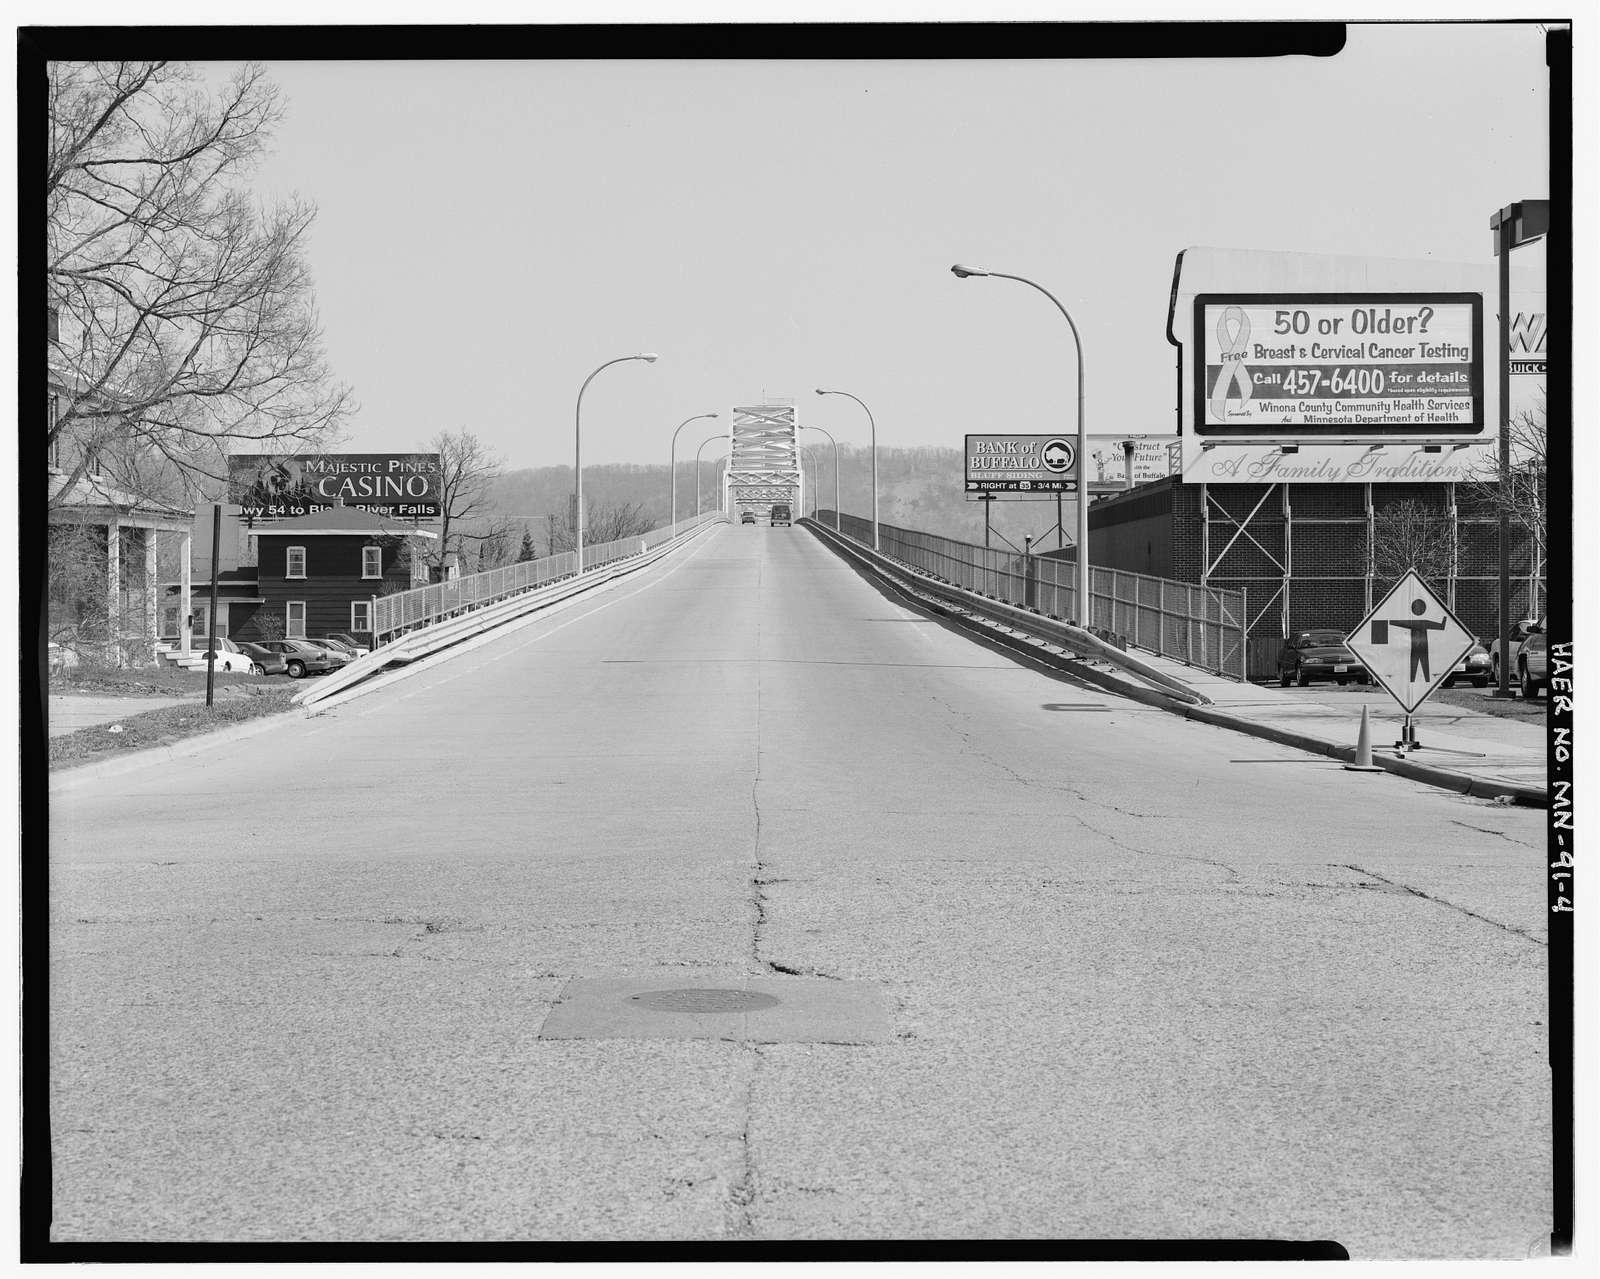 Bridge No. 5930, Spanning Mississippi River at Trunk Highway 43, Winona, Winona County, MN